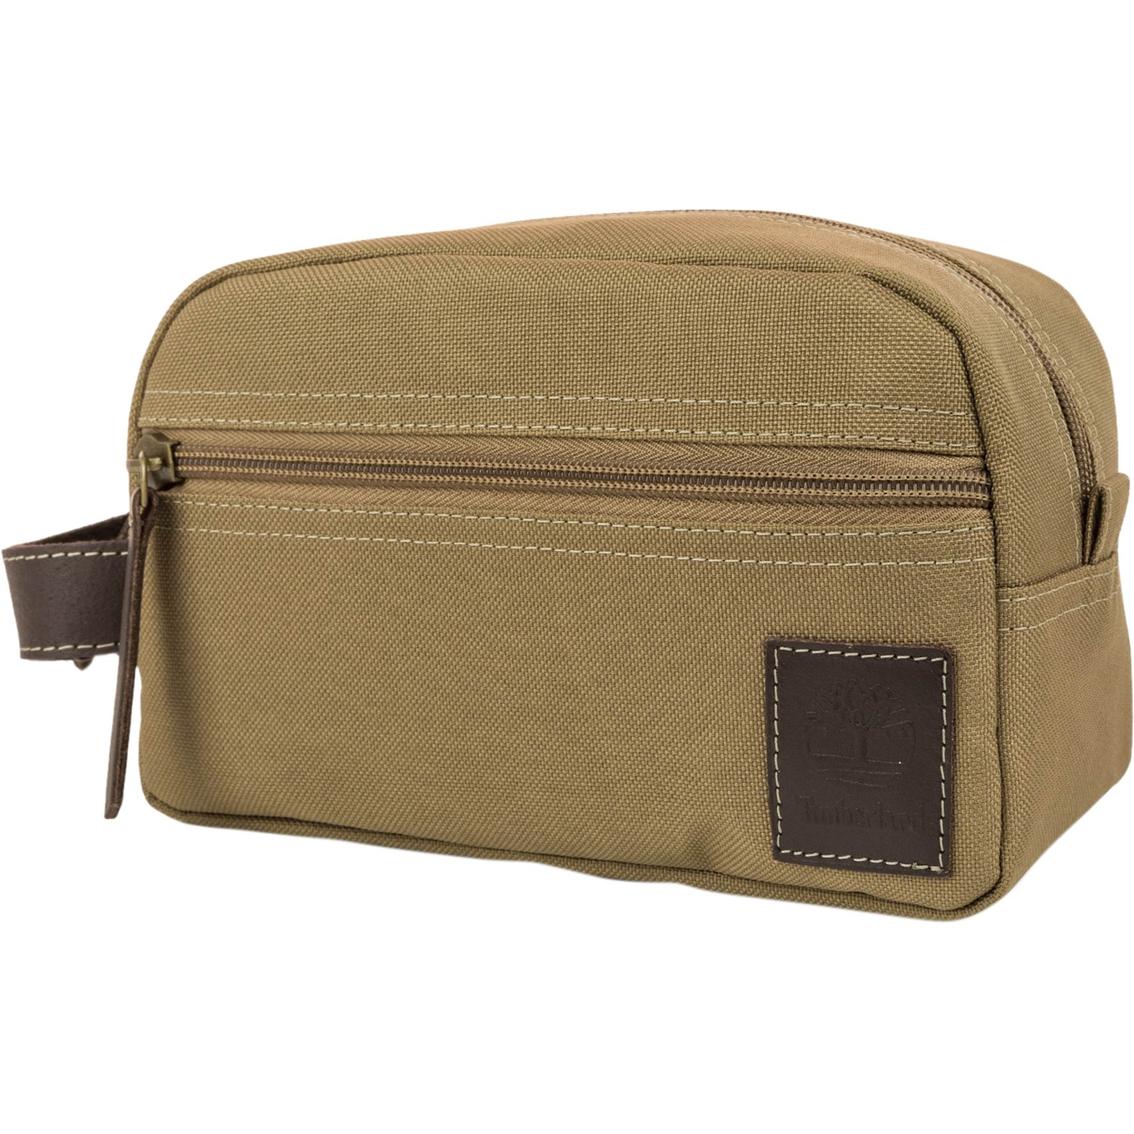 16caa859f52e Timberland Canvas Travel Kit